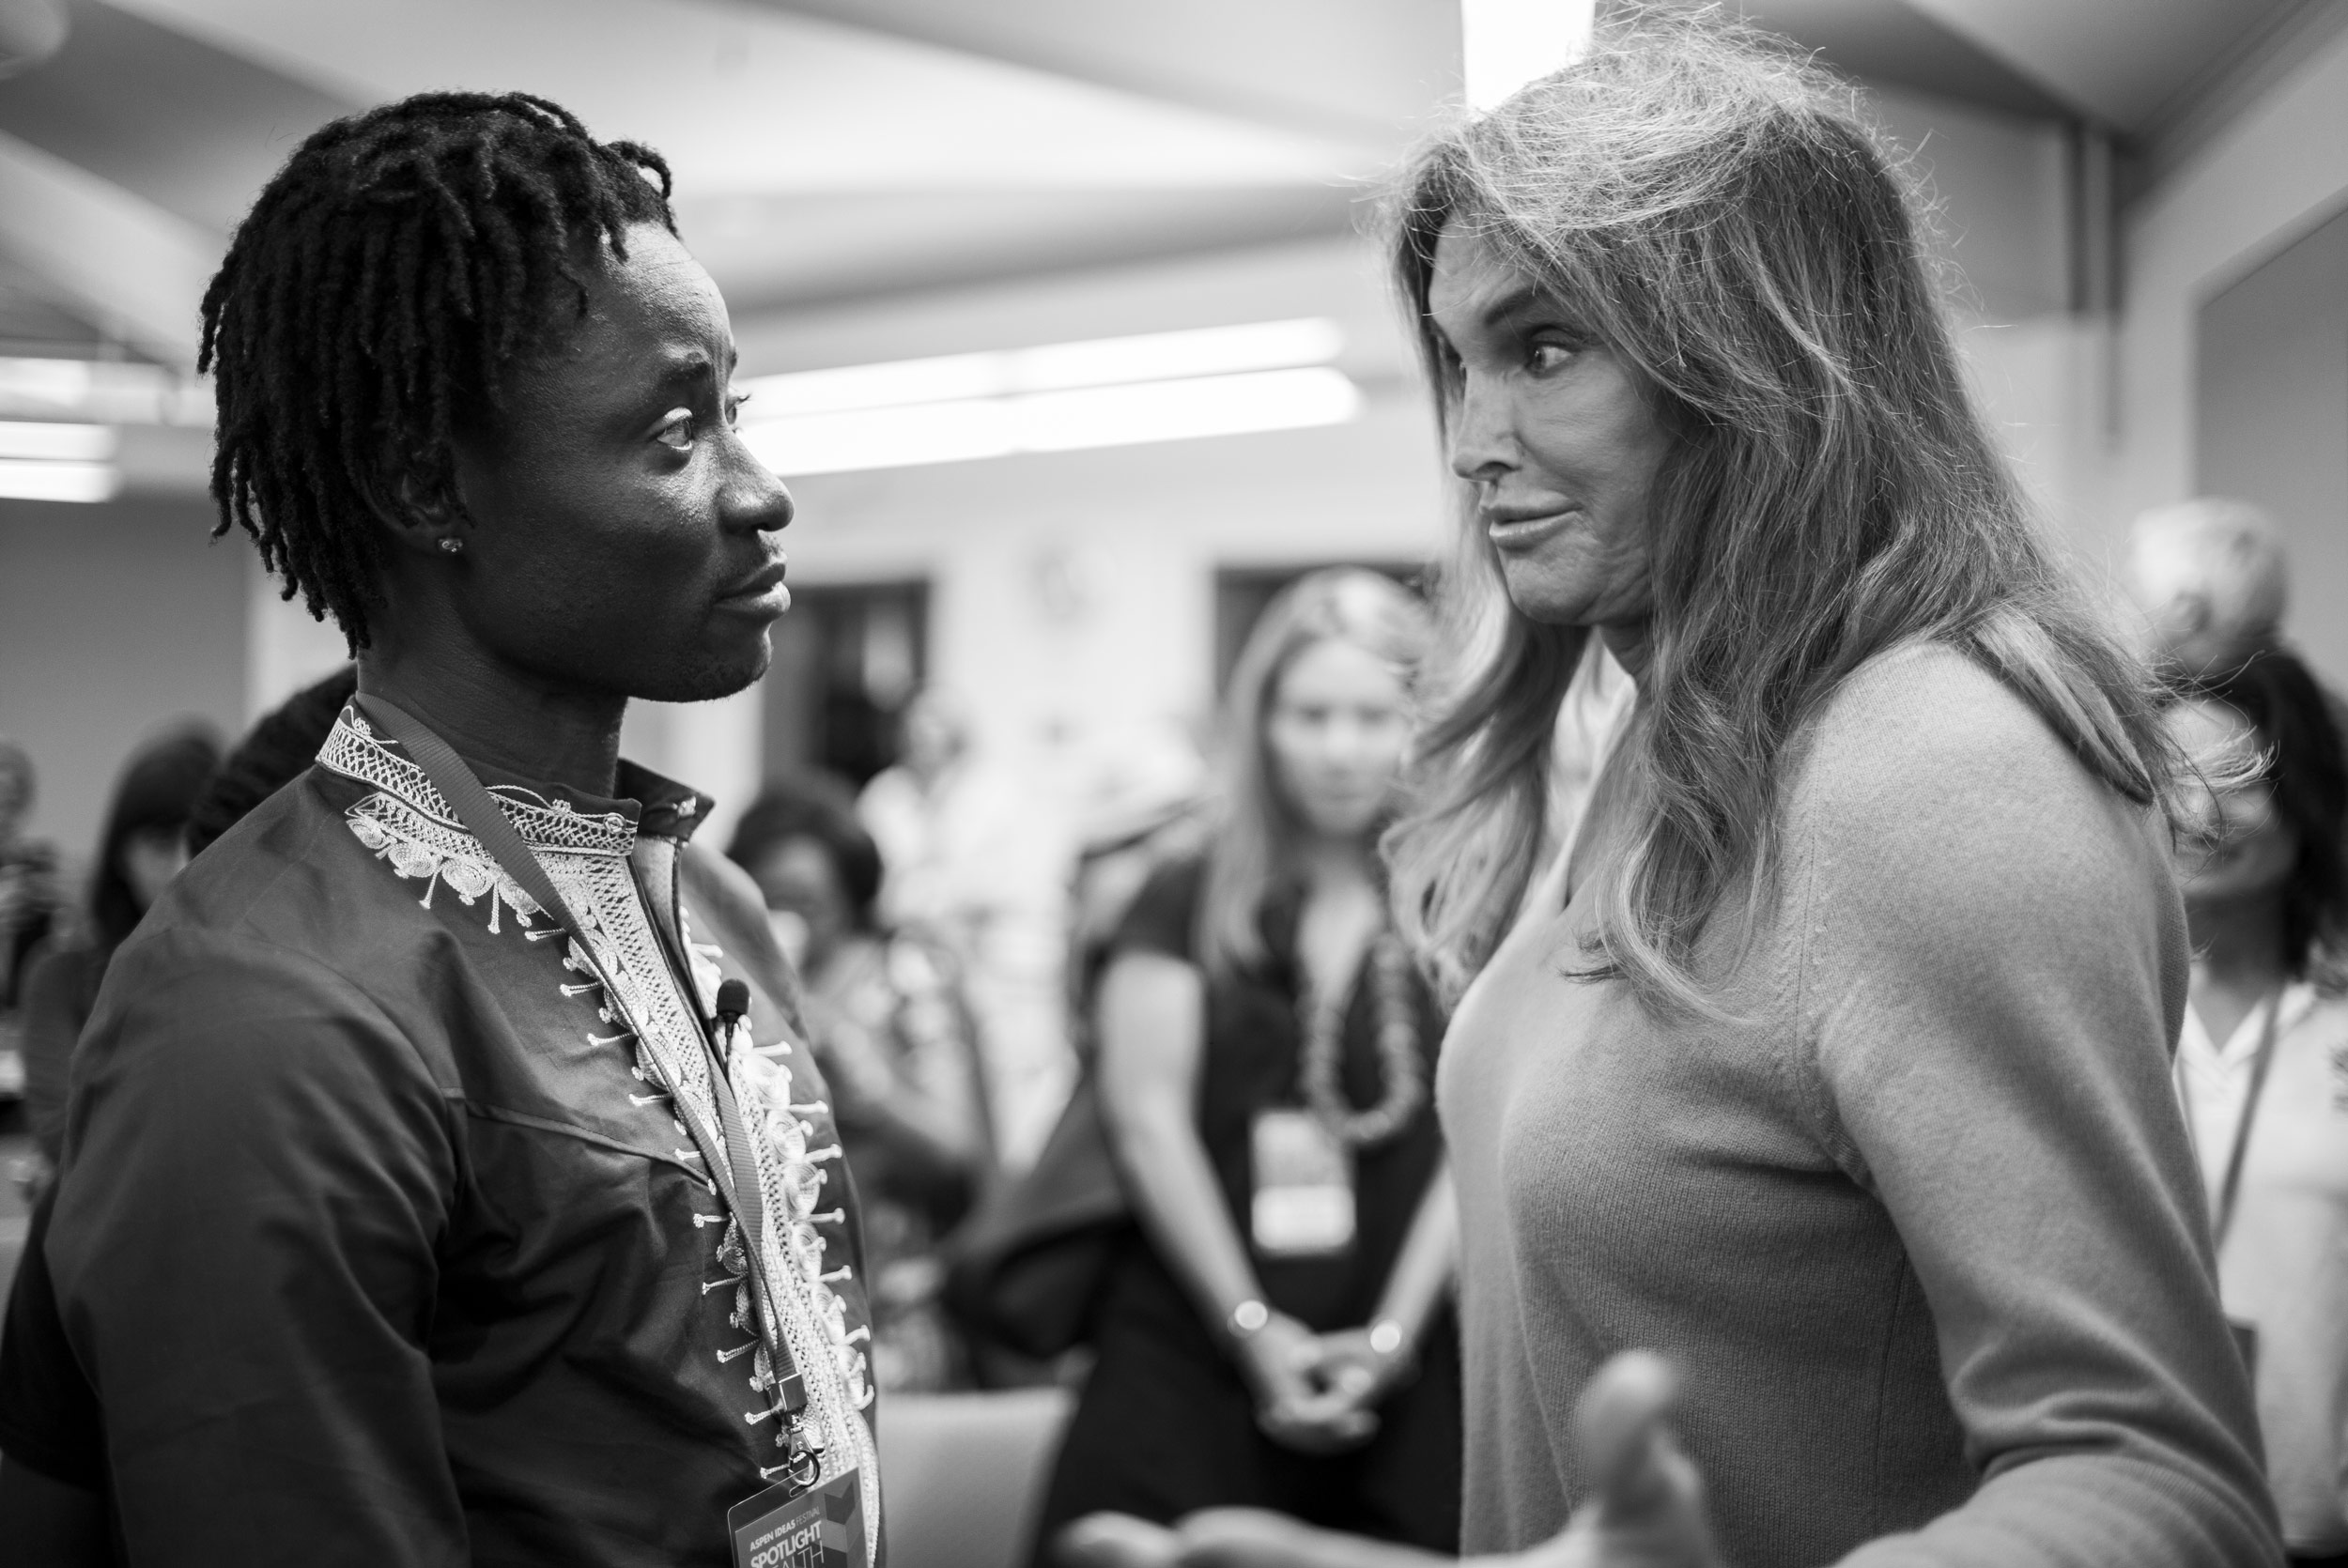 Bisi Alibi and Caitlyn Jenner at the 2016 Aspen Ideas Festival. Photo by Dan Bayer/Aspen Institute.